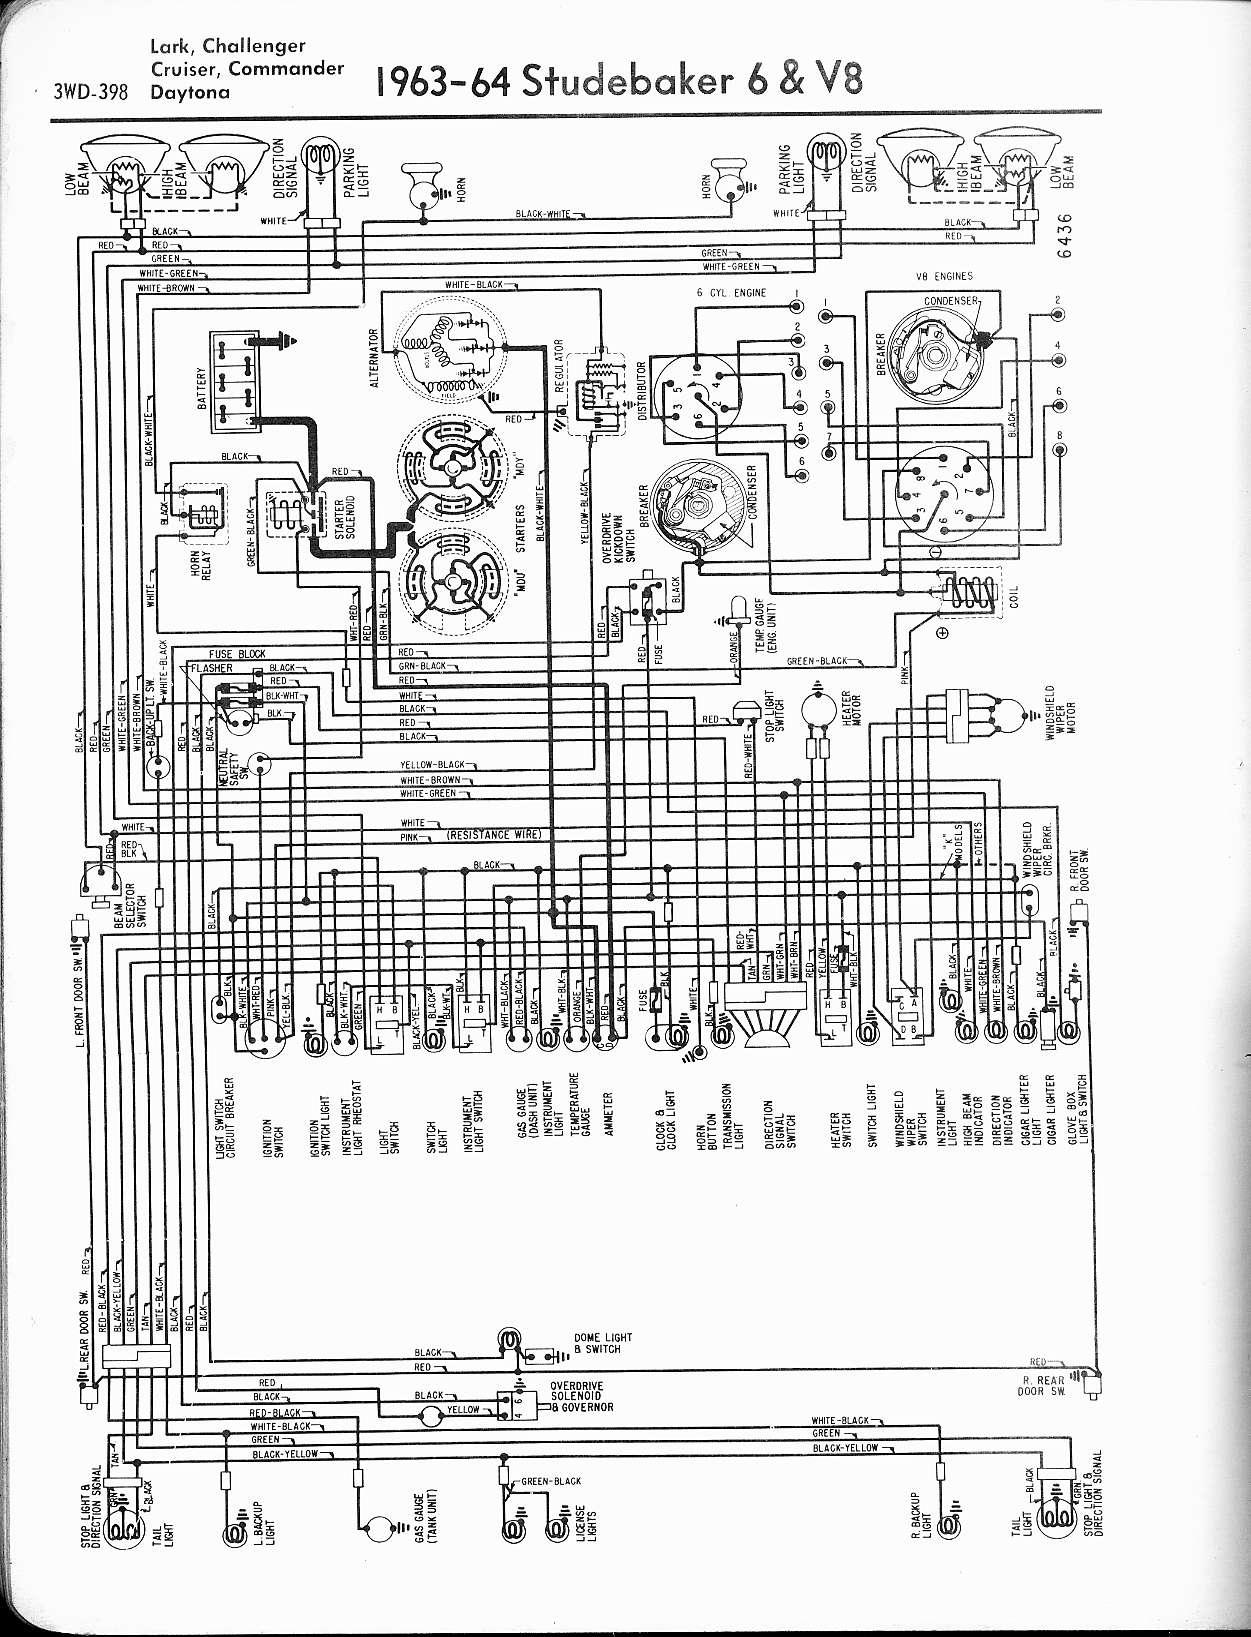 Awesome Avanti Car Wiring Diagrams Wiring Diagram Wiring Cloud Overrenstrafr09Org